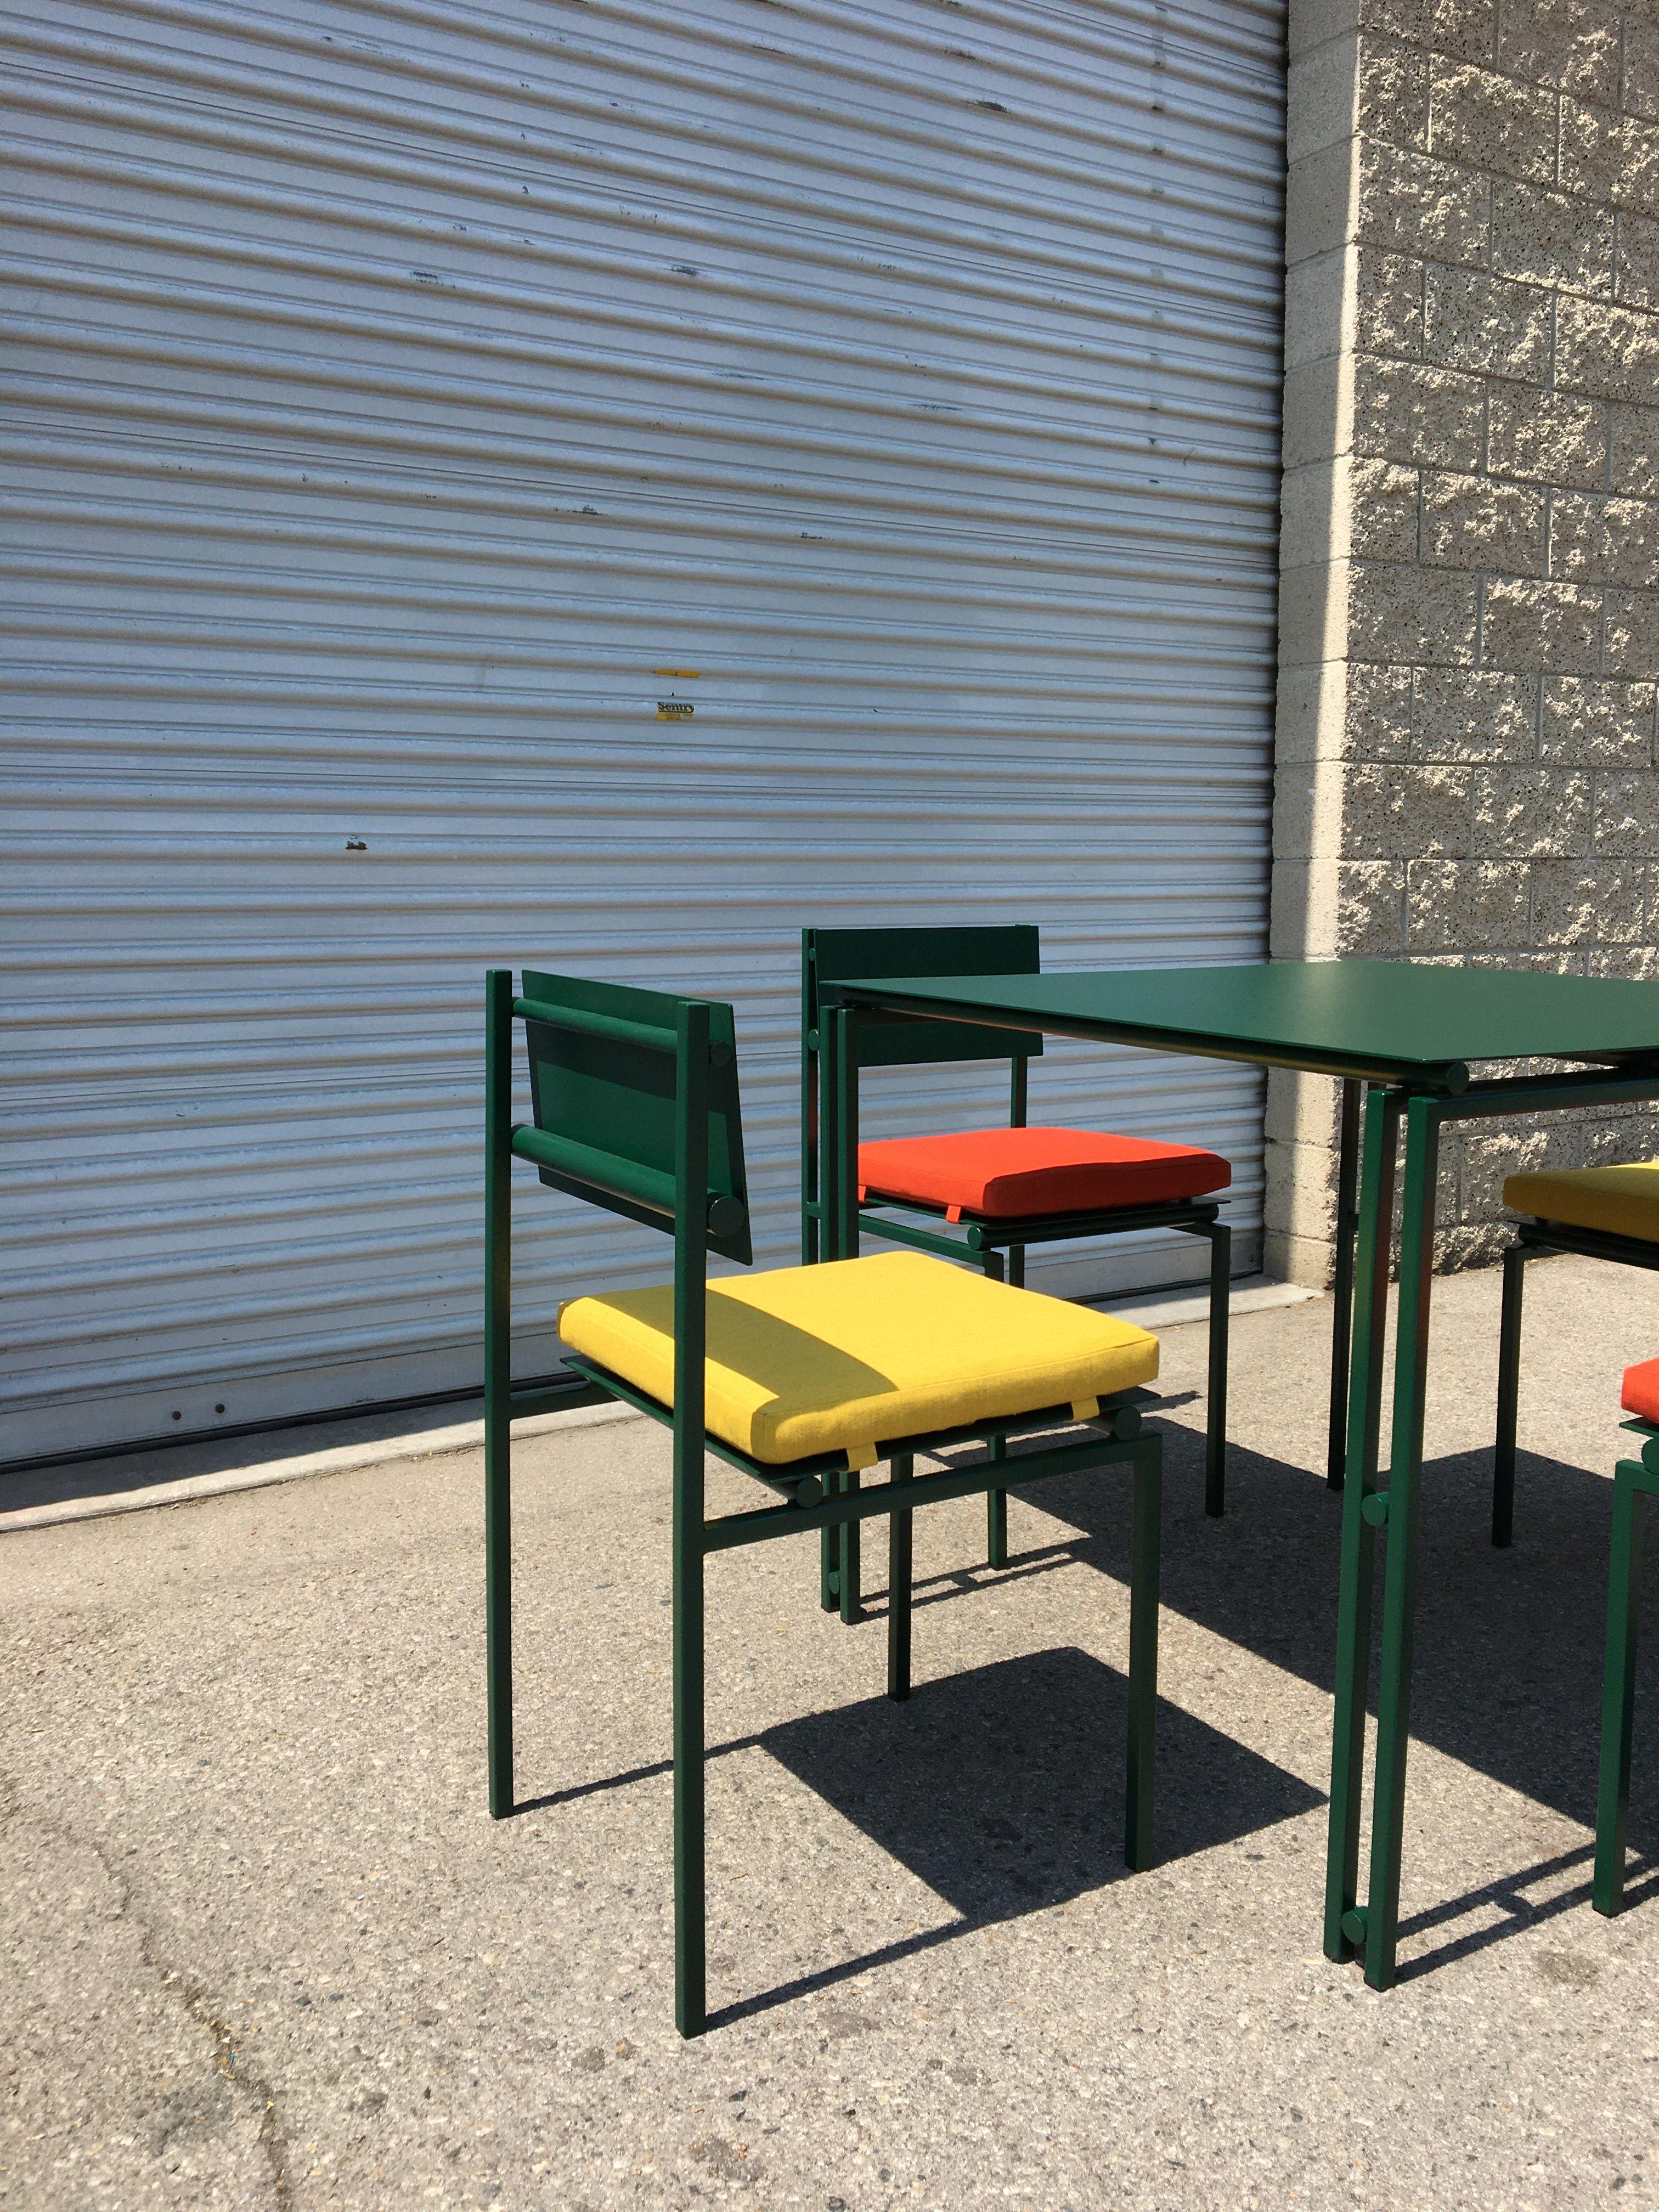 Suspension Metal Set - Breakfast Size product image 3